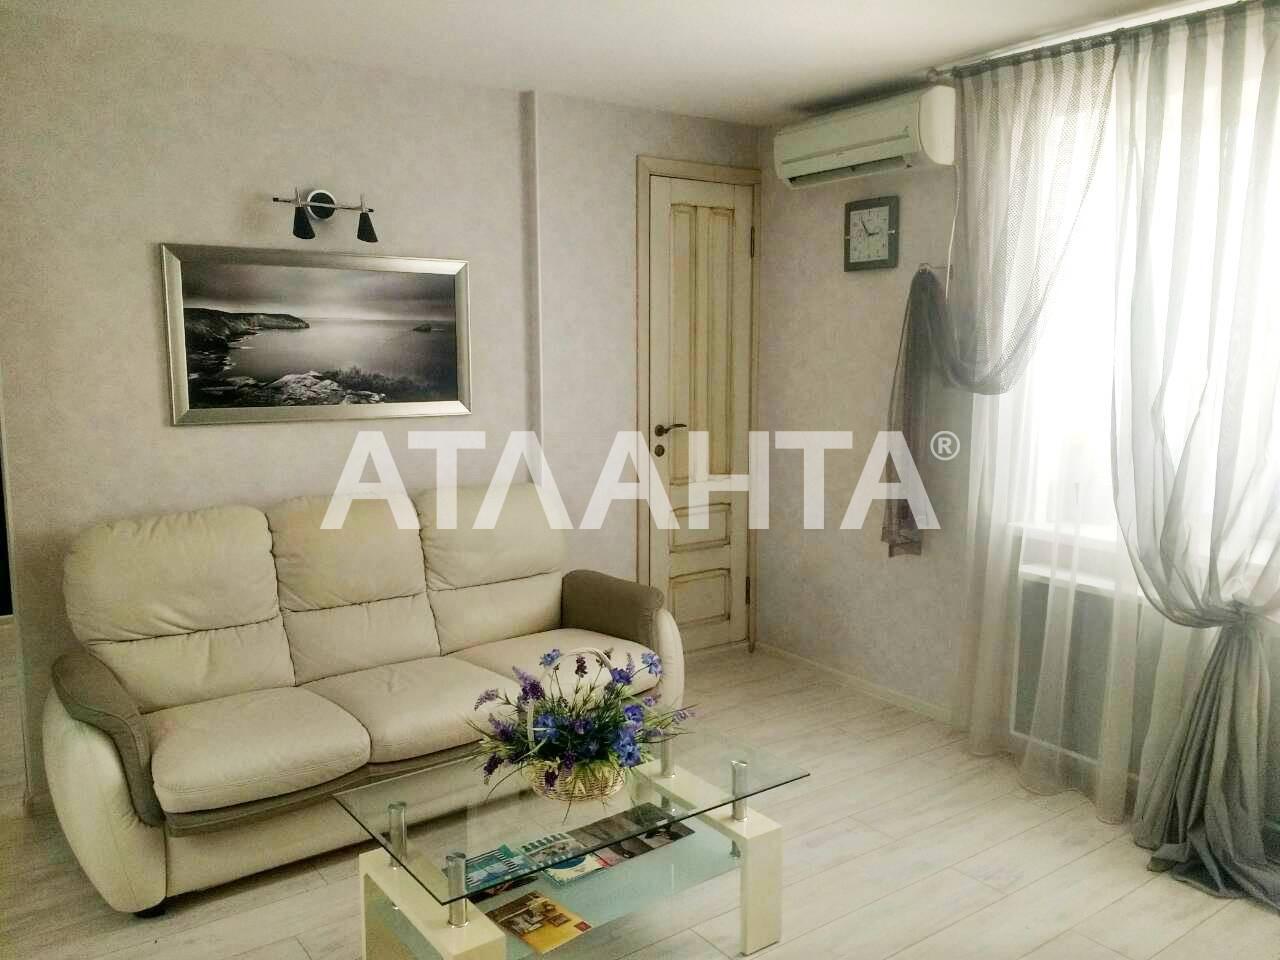 Продается 2-комнатная Квартира на ул. Зеленая — 40 000 у.е.